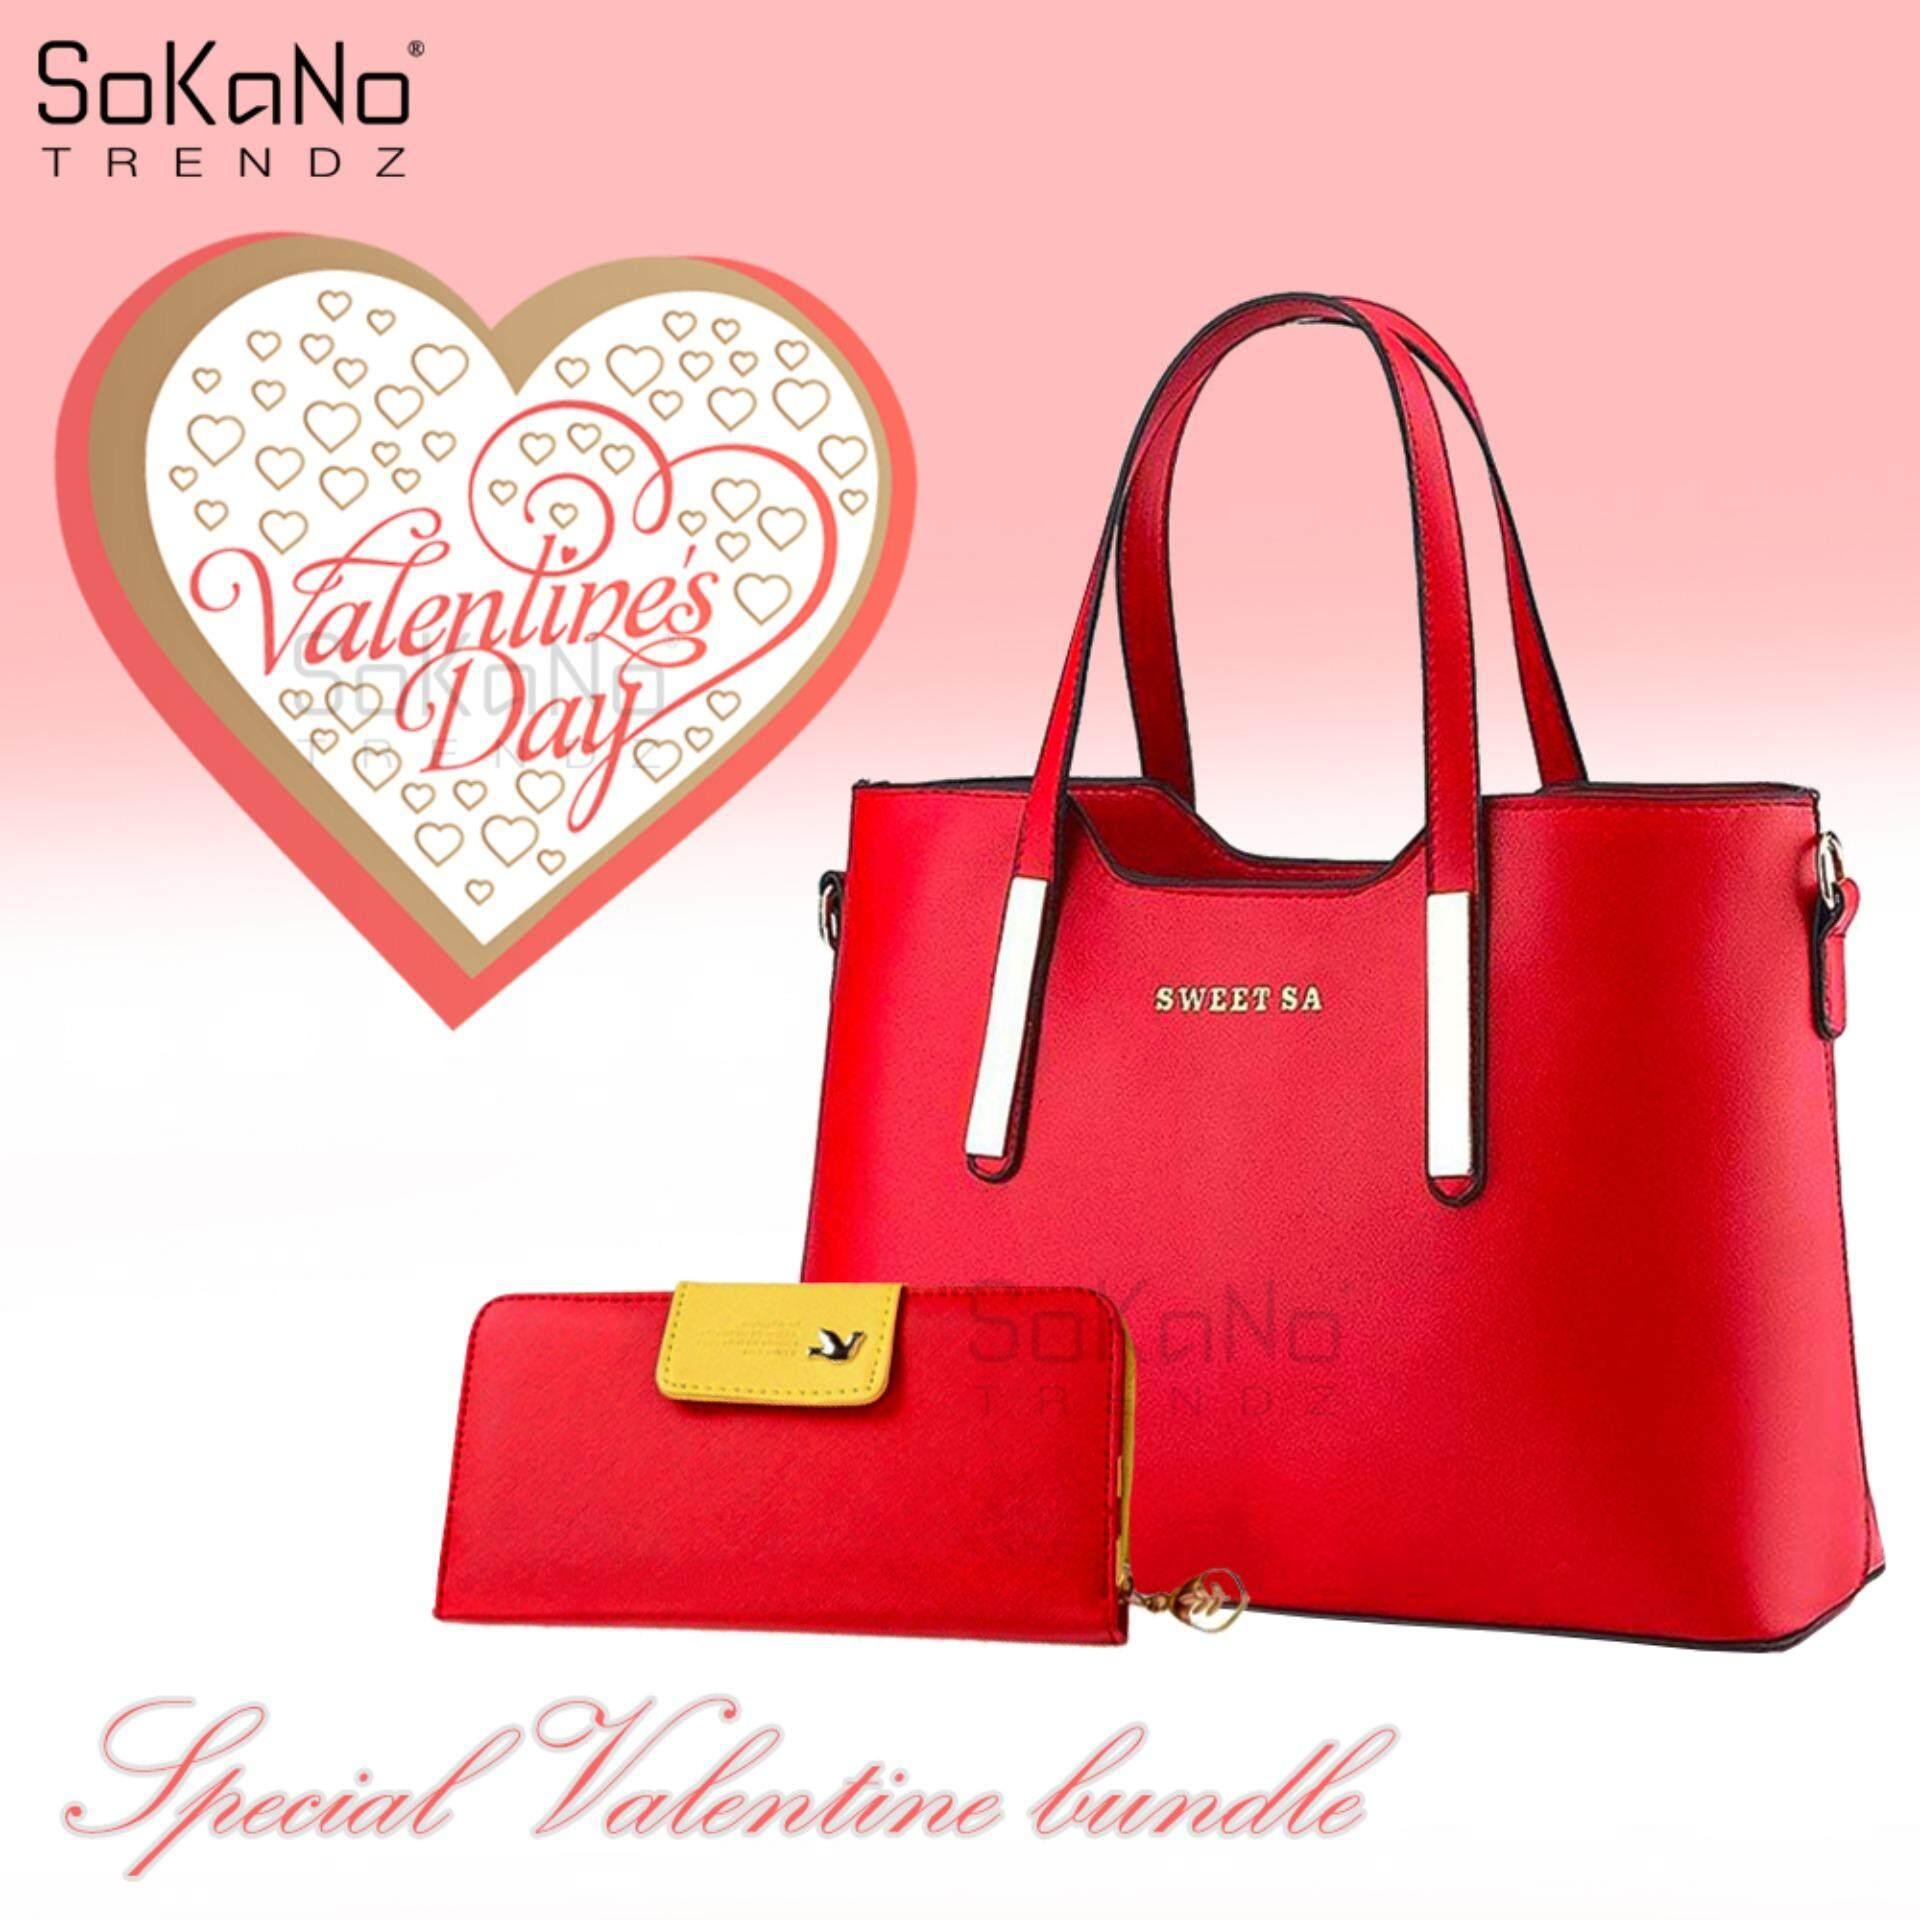 Valentine Special Bundle: SoKaNo Trendz Sweet SA PU Premium PU Leather Bag - Red + SKN903 Korean Style Premium Long Wallet Handbeg Wanita- Red